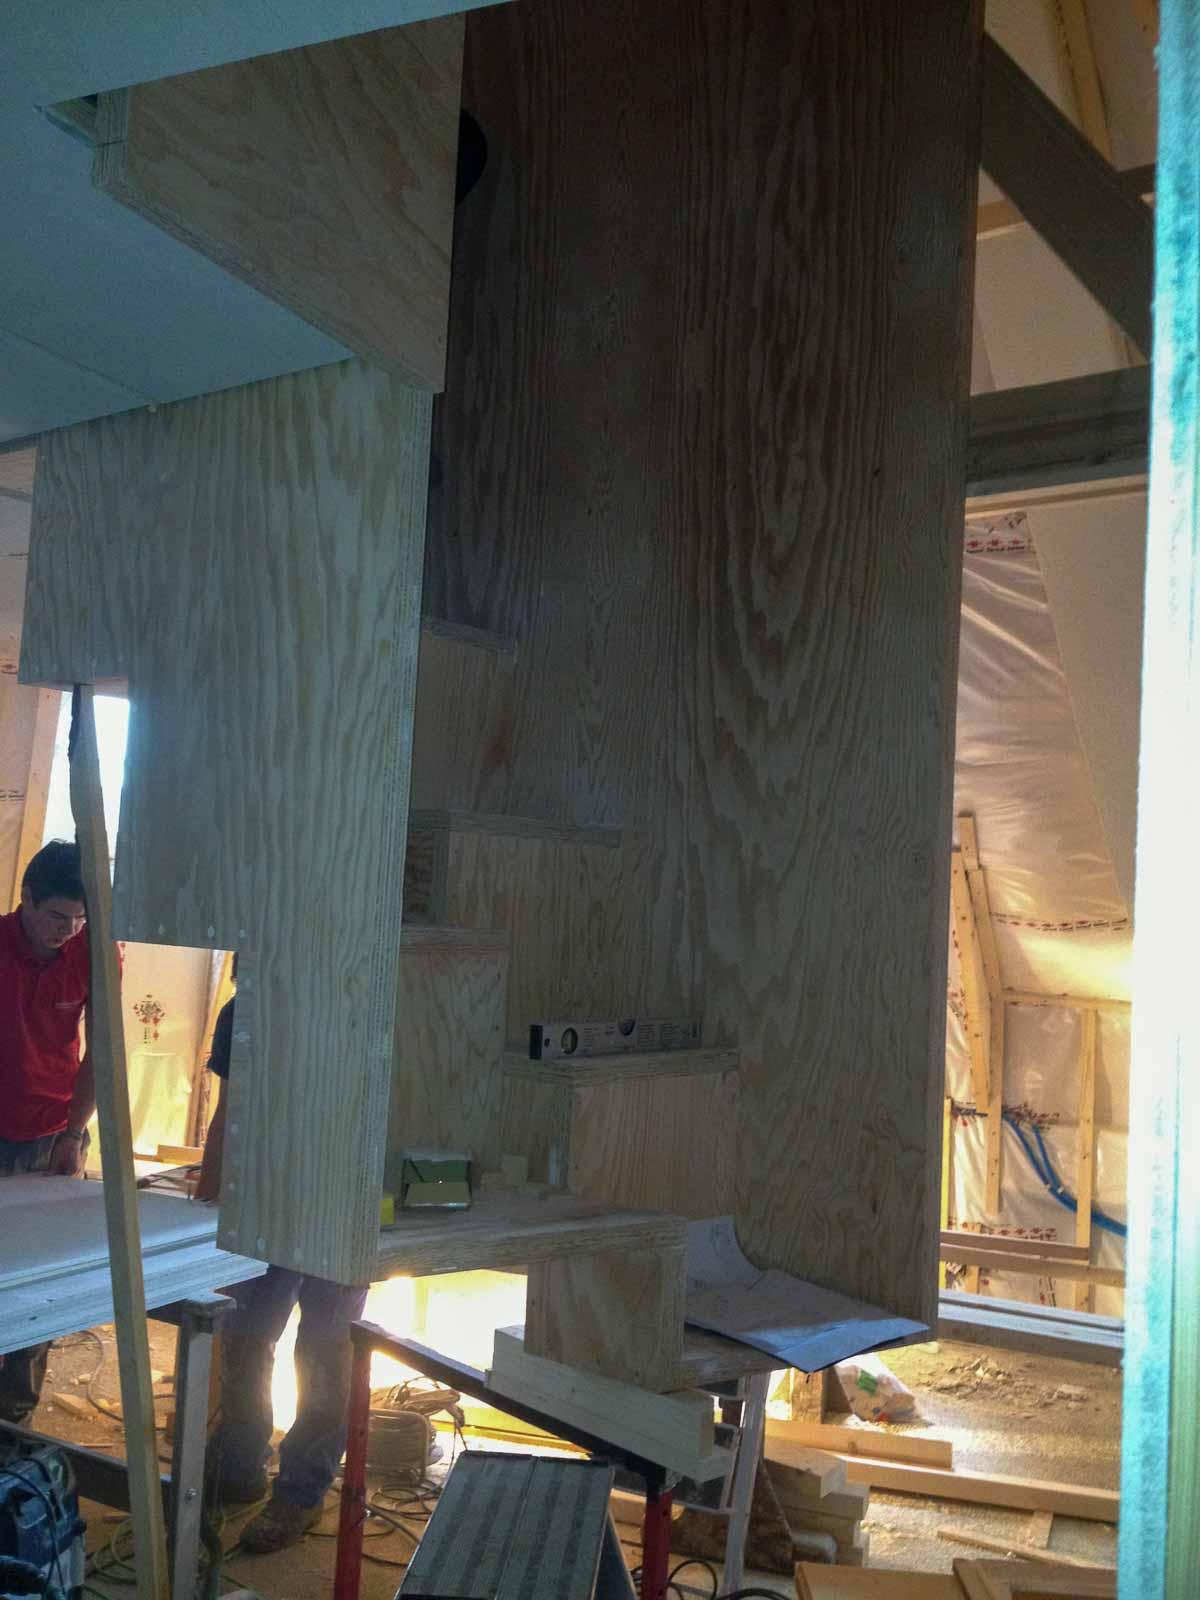 Wooddesign_Holzdesign_Treppe_Holztreppe_schwebend_2-teilig_atelierducret_freiburg(11)